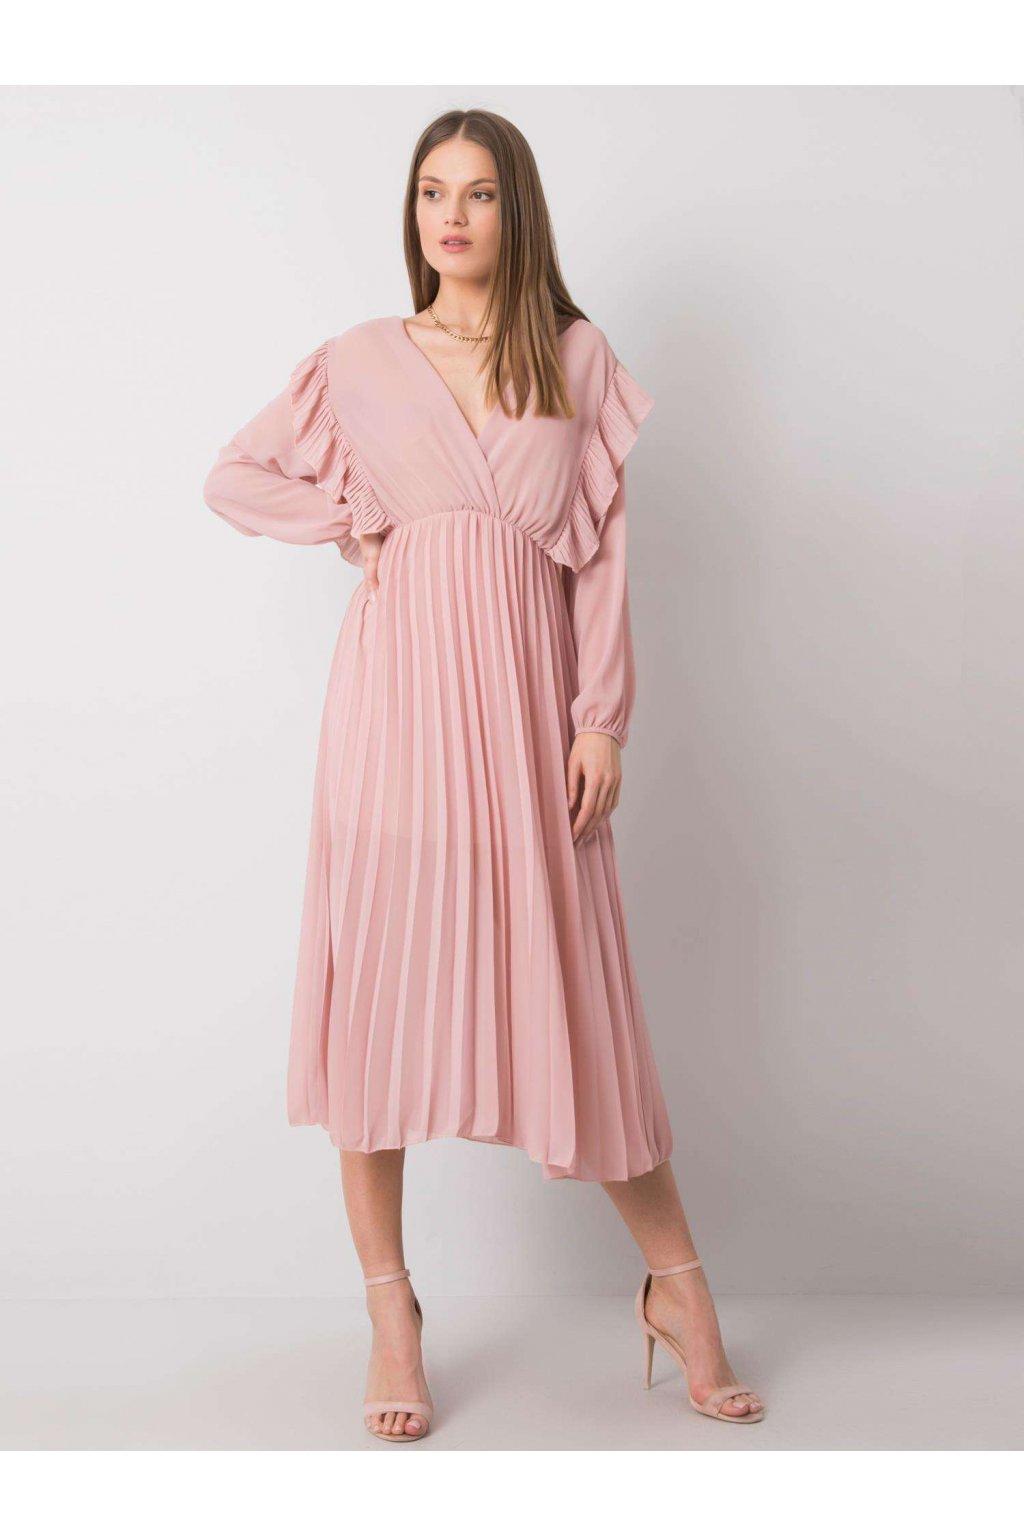 pol pl Brudnorozowa sukienka Frankie 362576 1